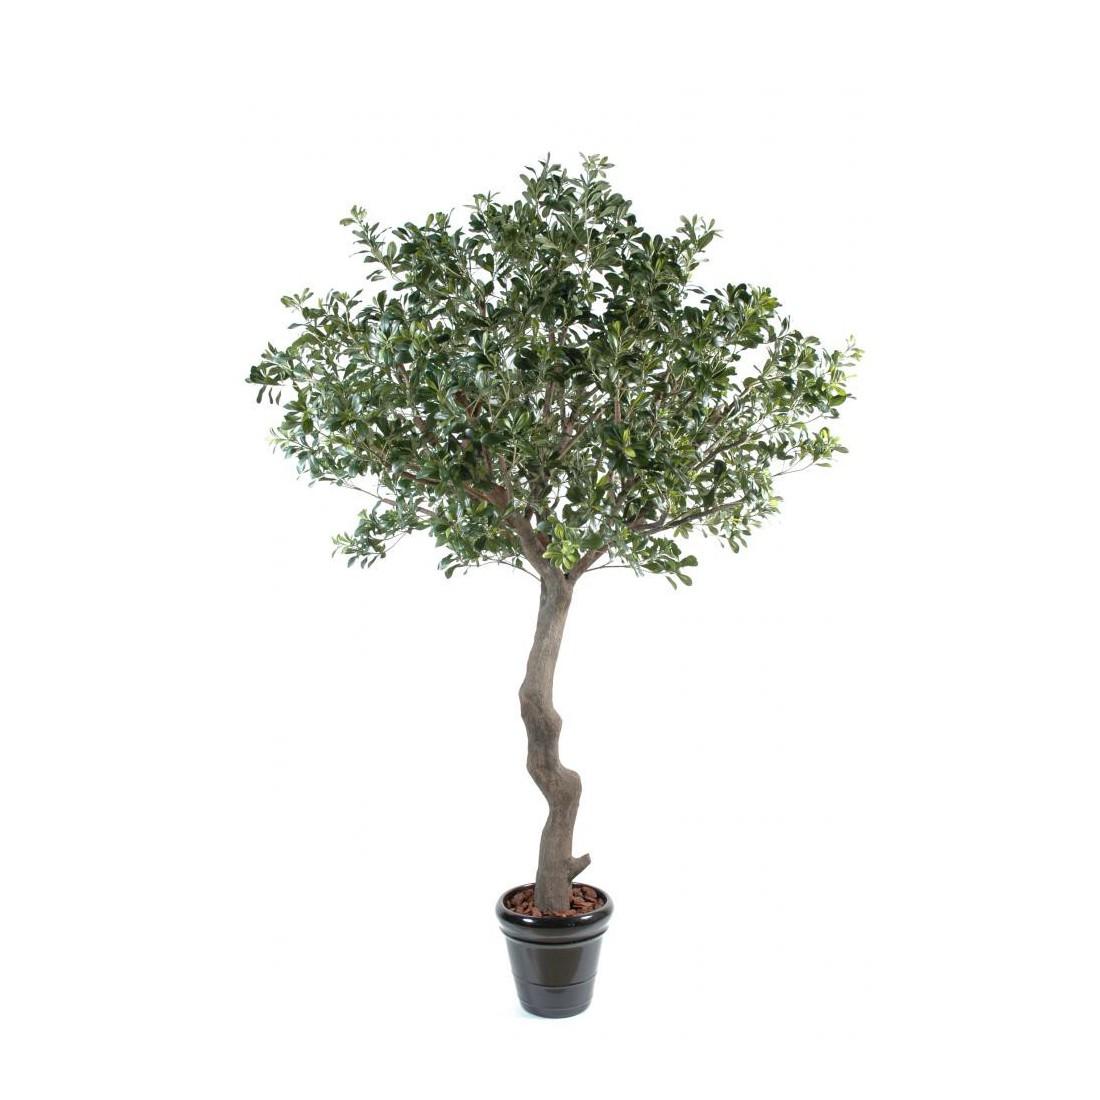 pittosporum artificiel arbre 260 cm arbres mediterraneens reflets nature lyon. Black Bedroom Furniture Sets. Home Design Ideas